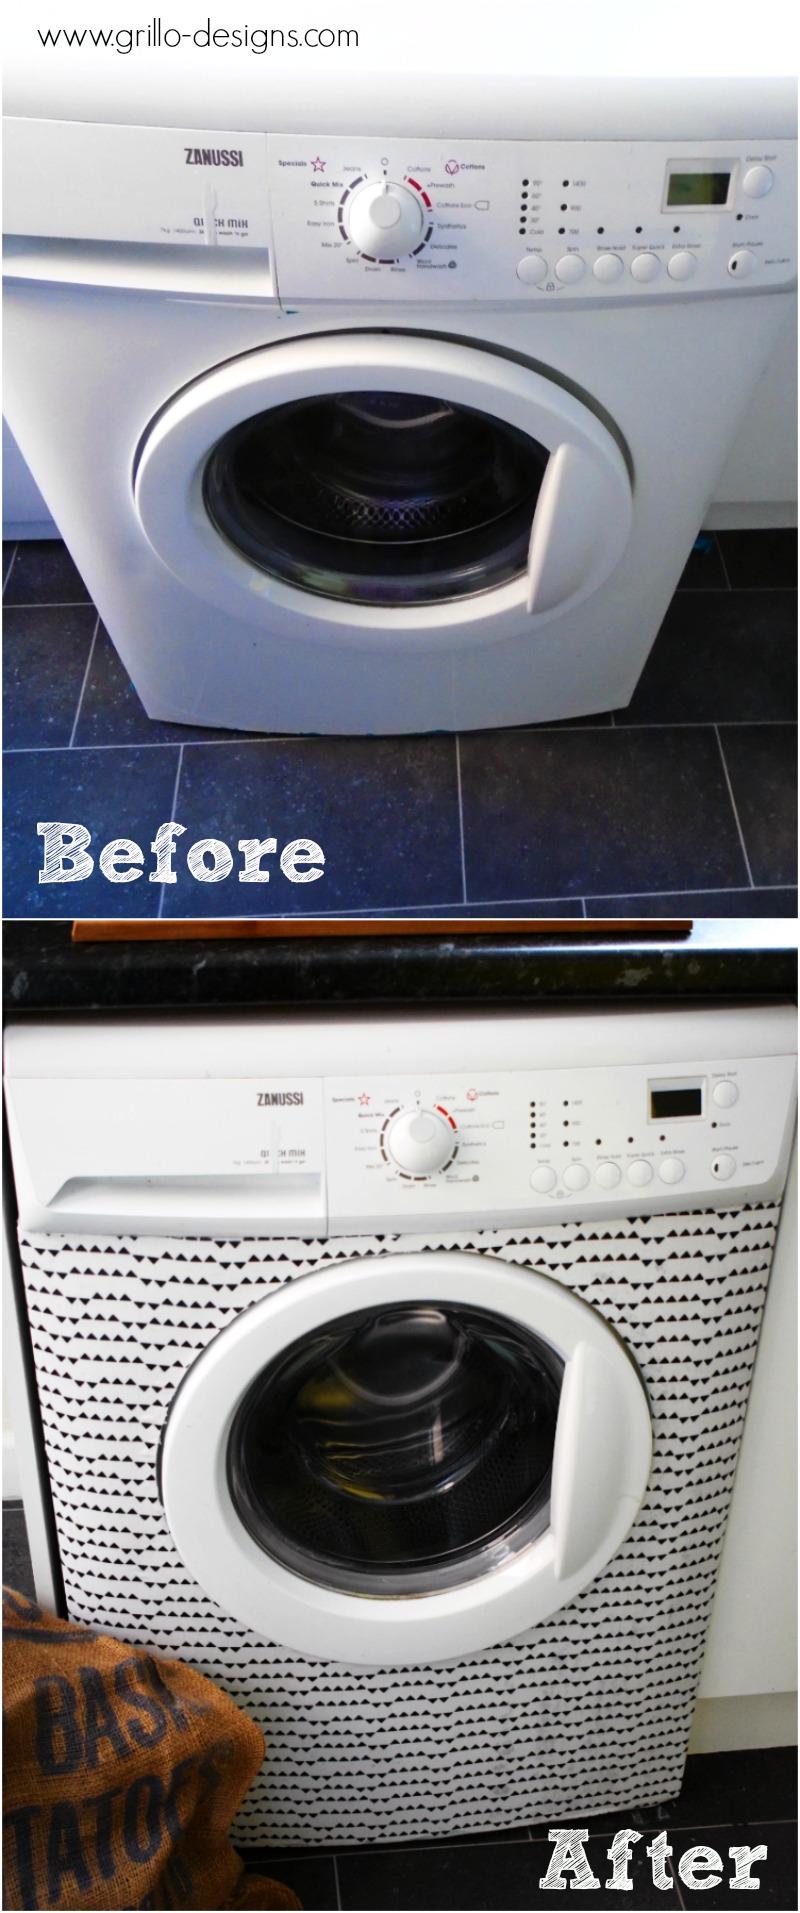 Washing machine makeover with fabric